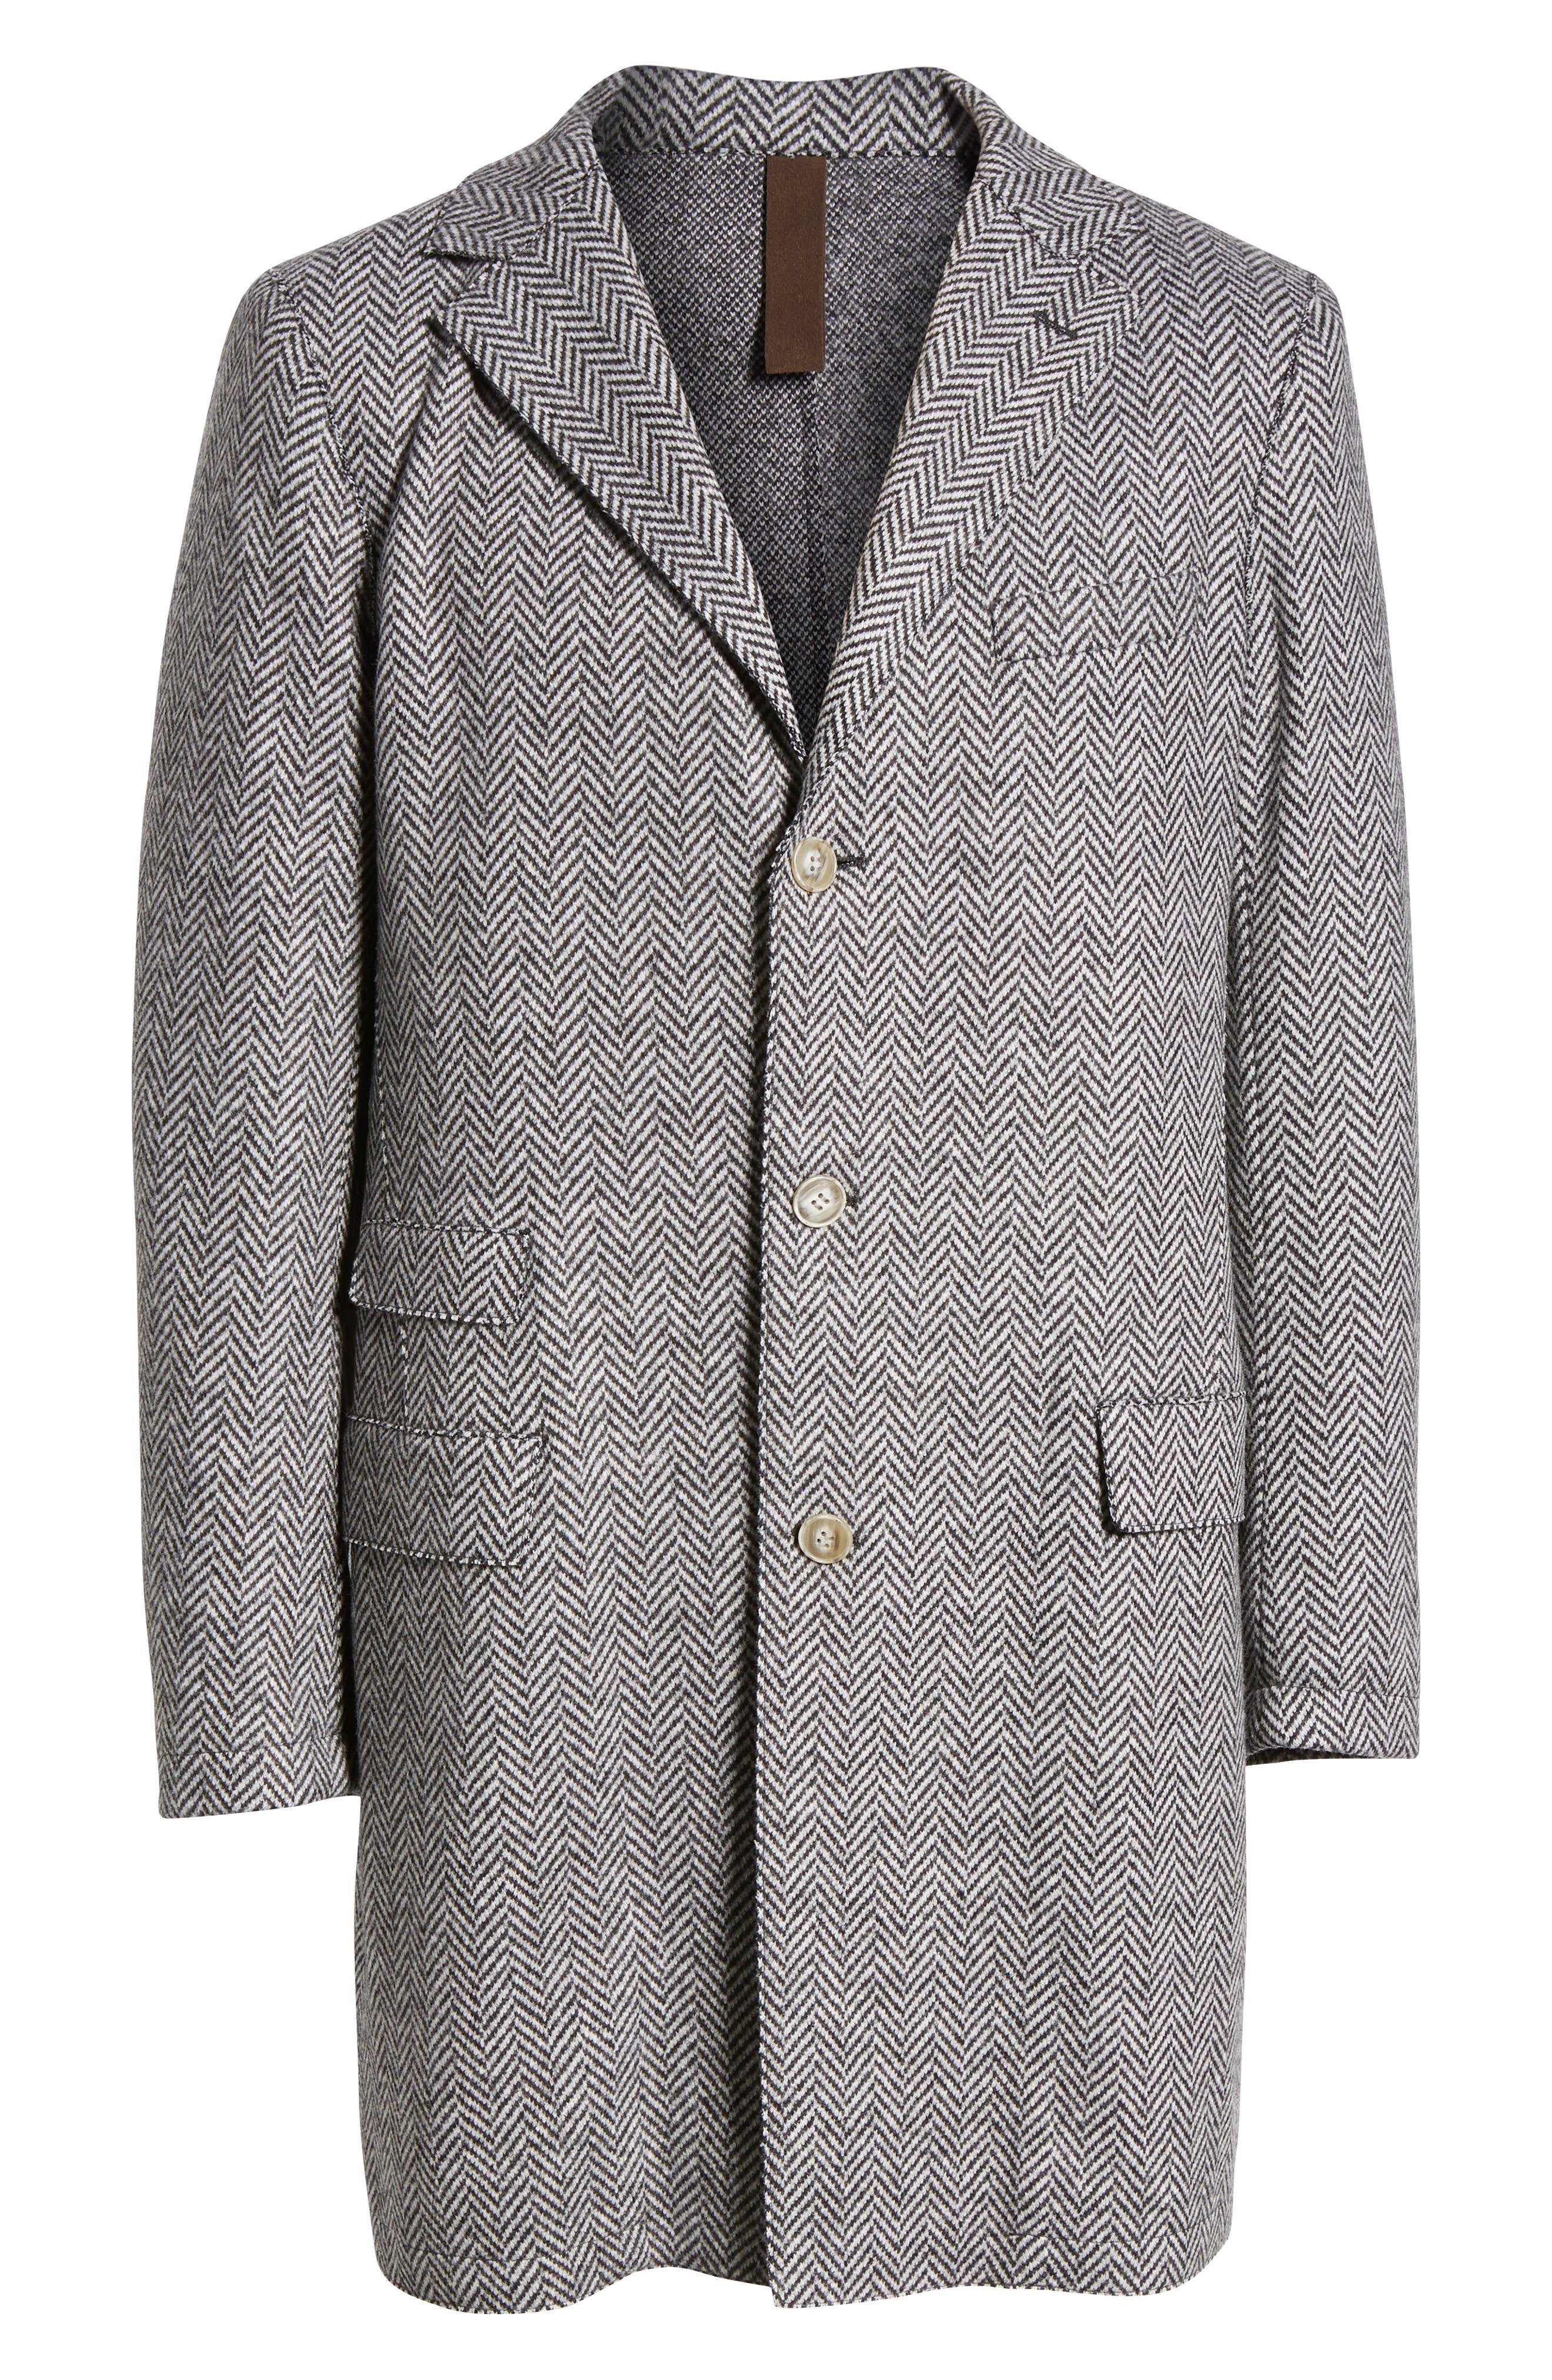 Trim Fit Wool Blend Top Coat,                             Alternate thumbnail 6, color,                             GREY